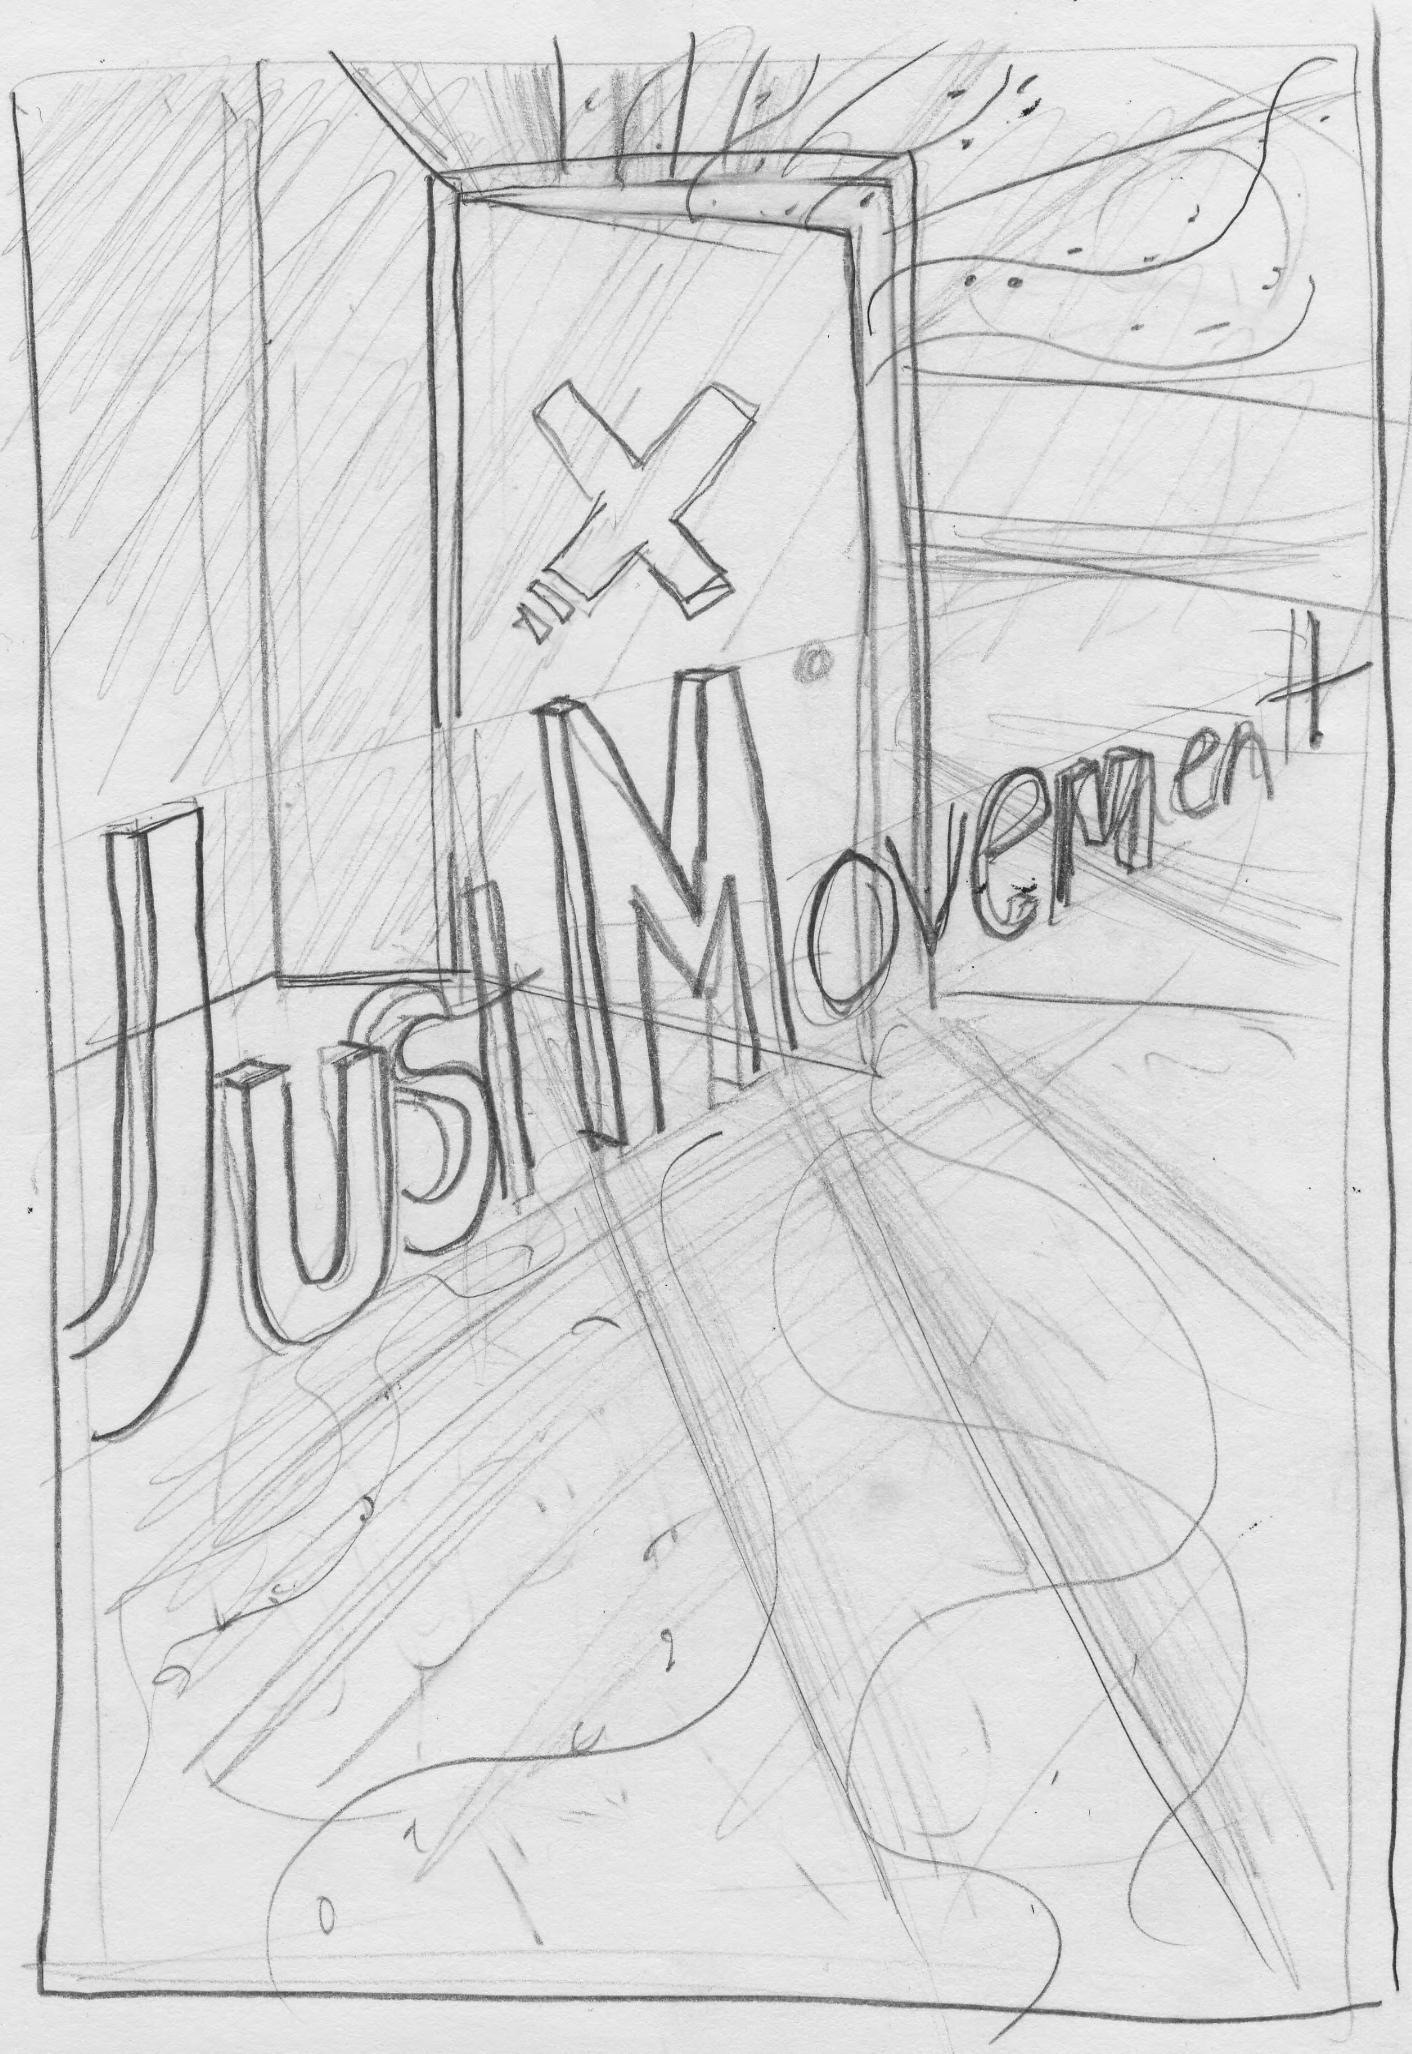 Robert DeLong : Just Movement Tour - image 8 - student project